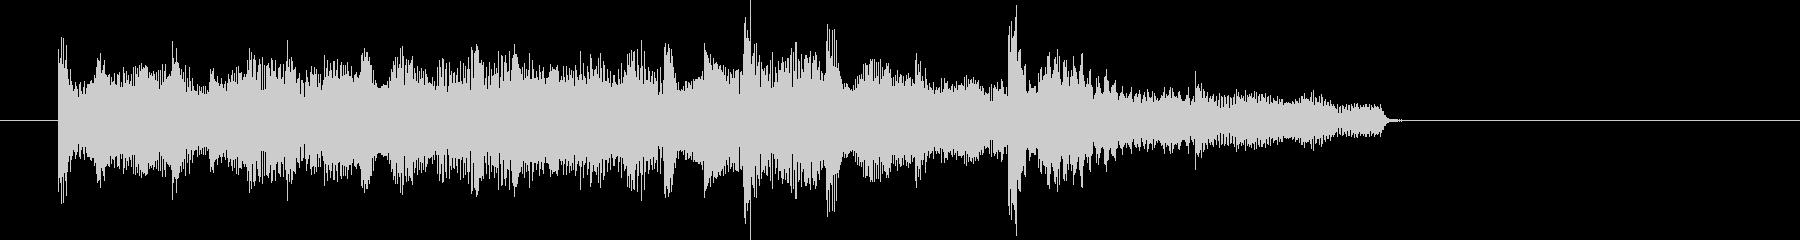 E.ピアノによる場面転換・アイキャッチ2の未再生の波形